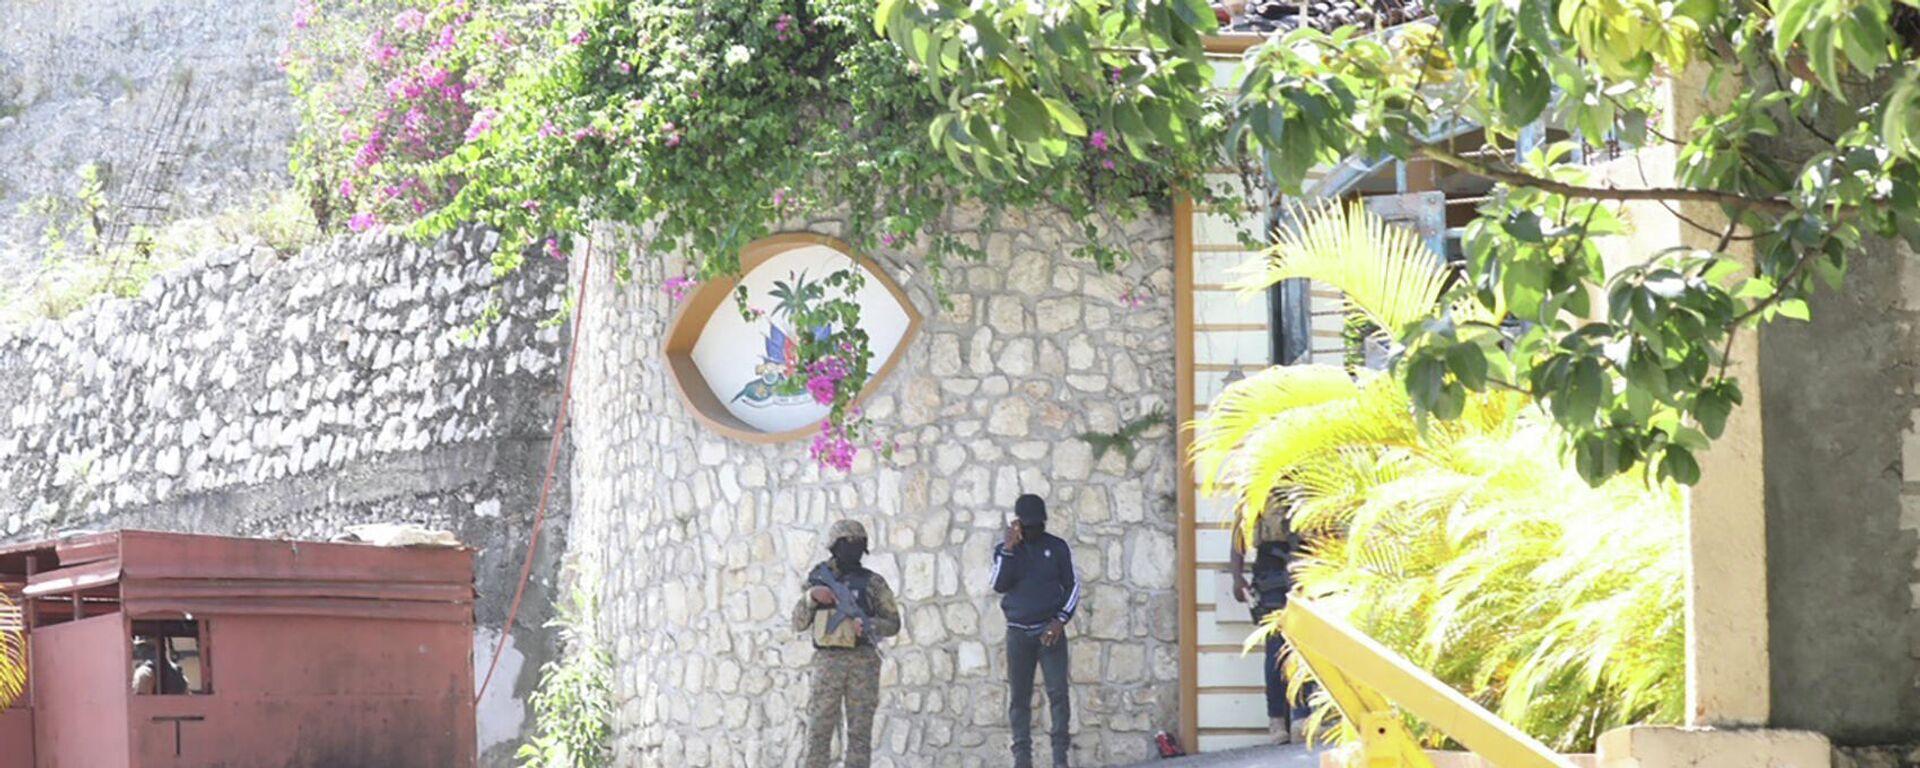 Residencia presidencial en Puerto Príncipe, Haití - Sputnik Mundo, 1920, 11.07.2021